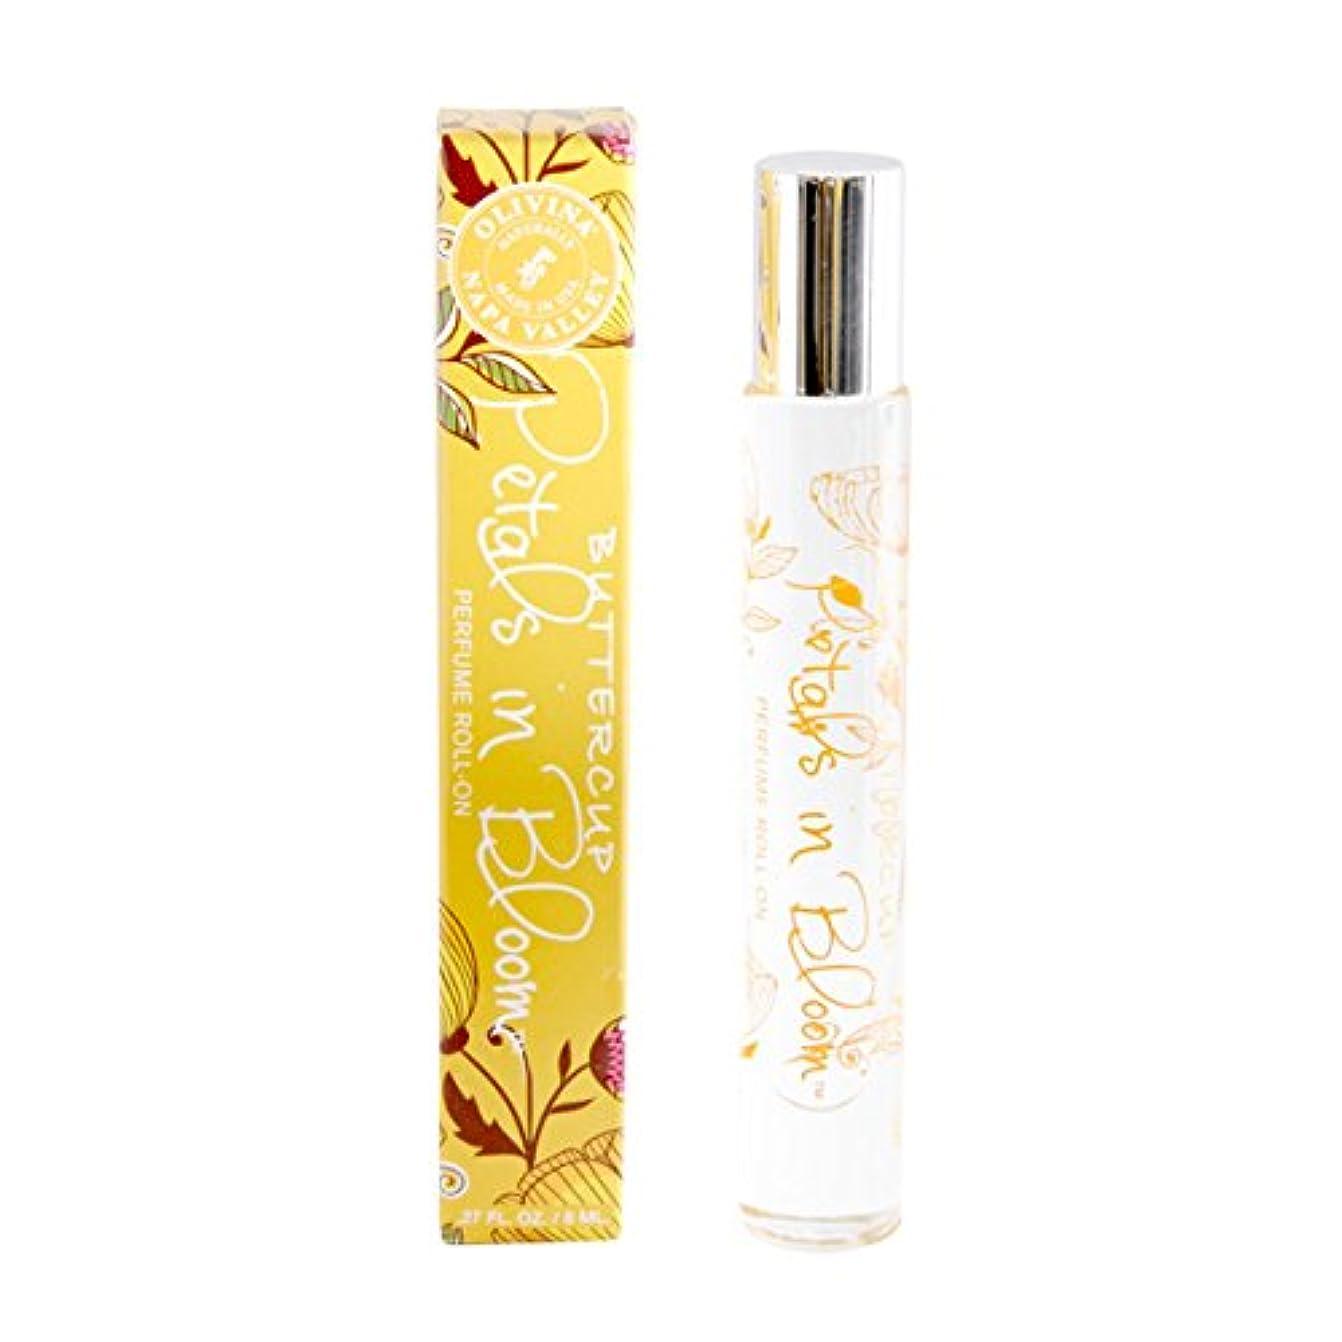 Napa Valley Apothecary Petals in Bloom パフューム ロールオン バターカップ perfume roll-on Buttercup ナパバレーアポセカリー ペタルズインブルーム Olivina...